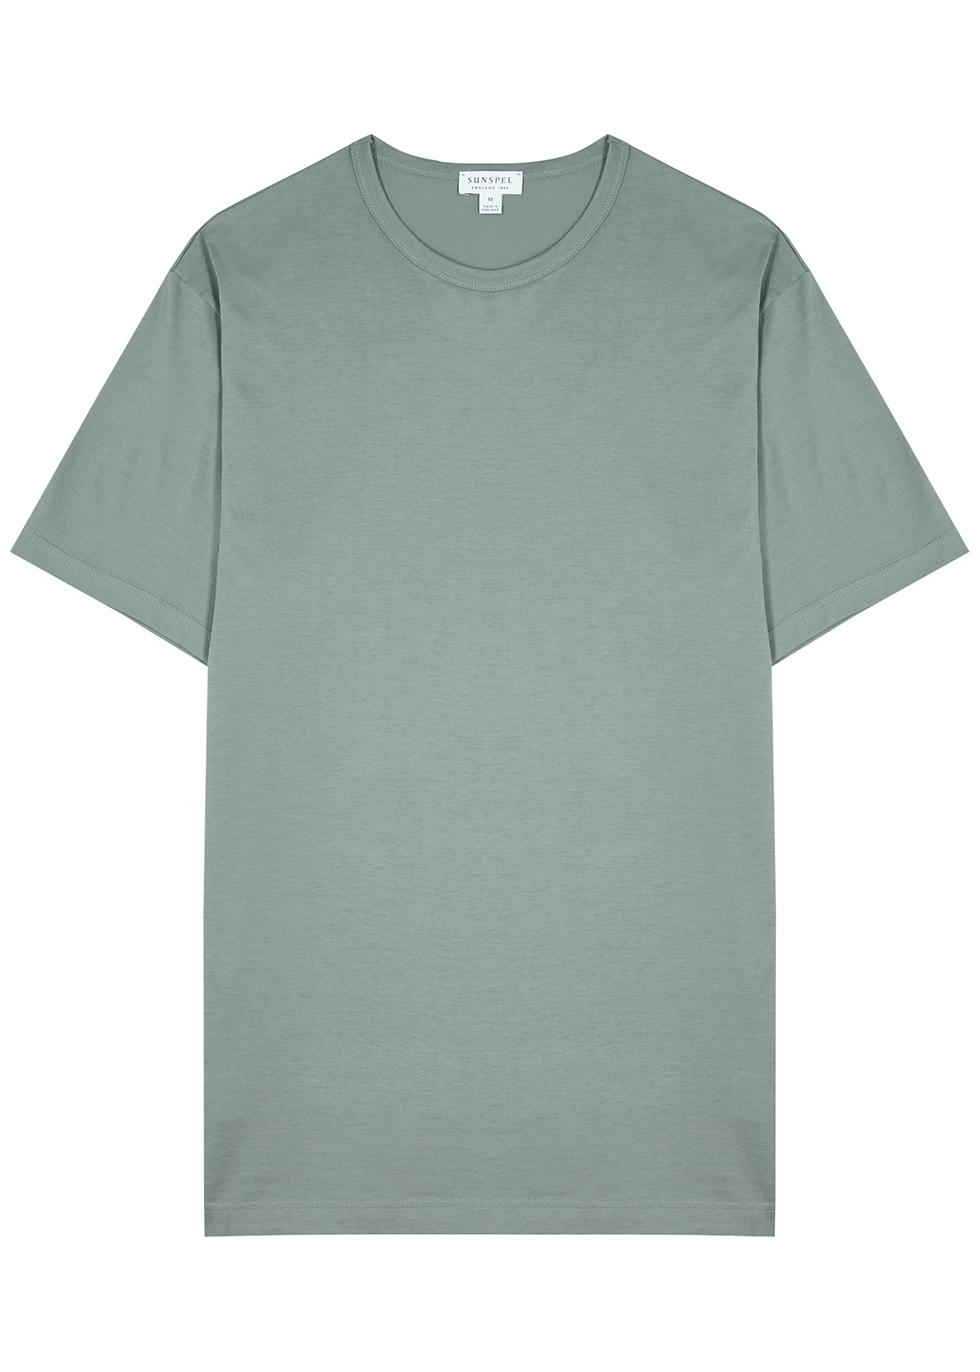 Sage cotton T-shirt